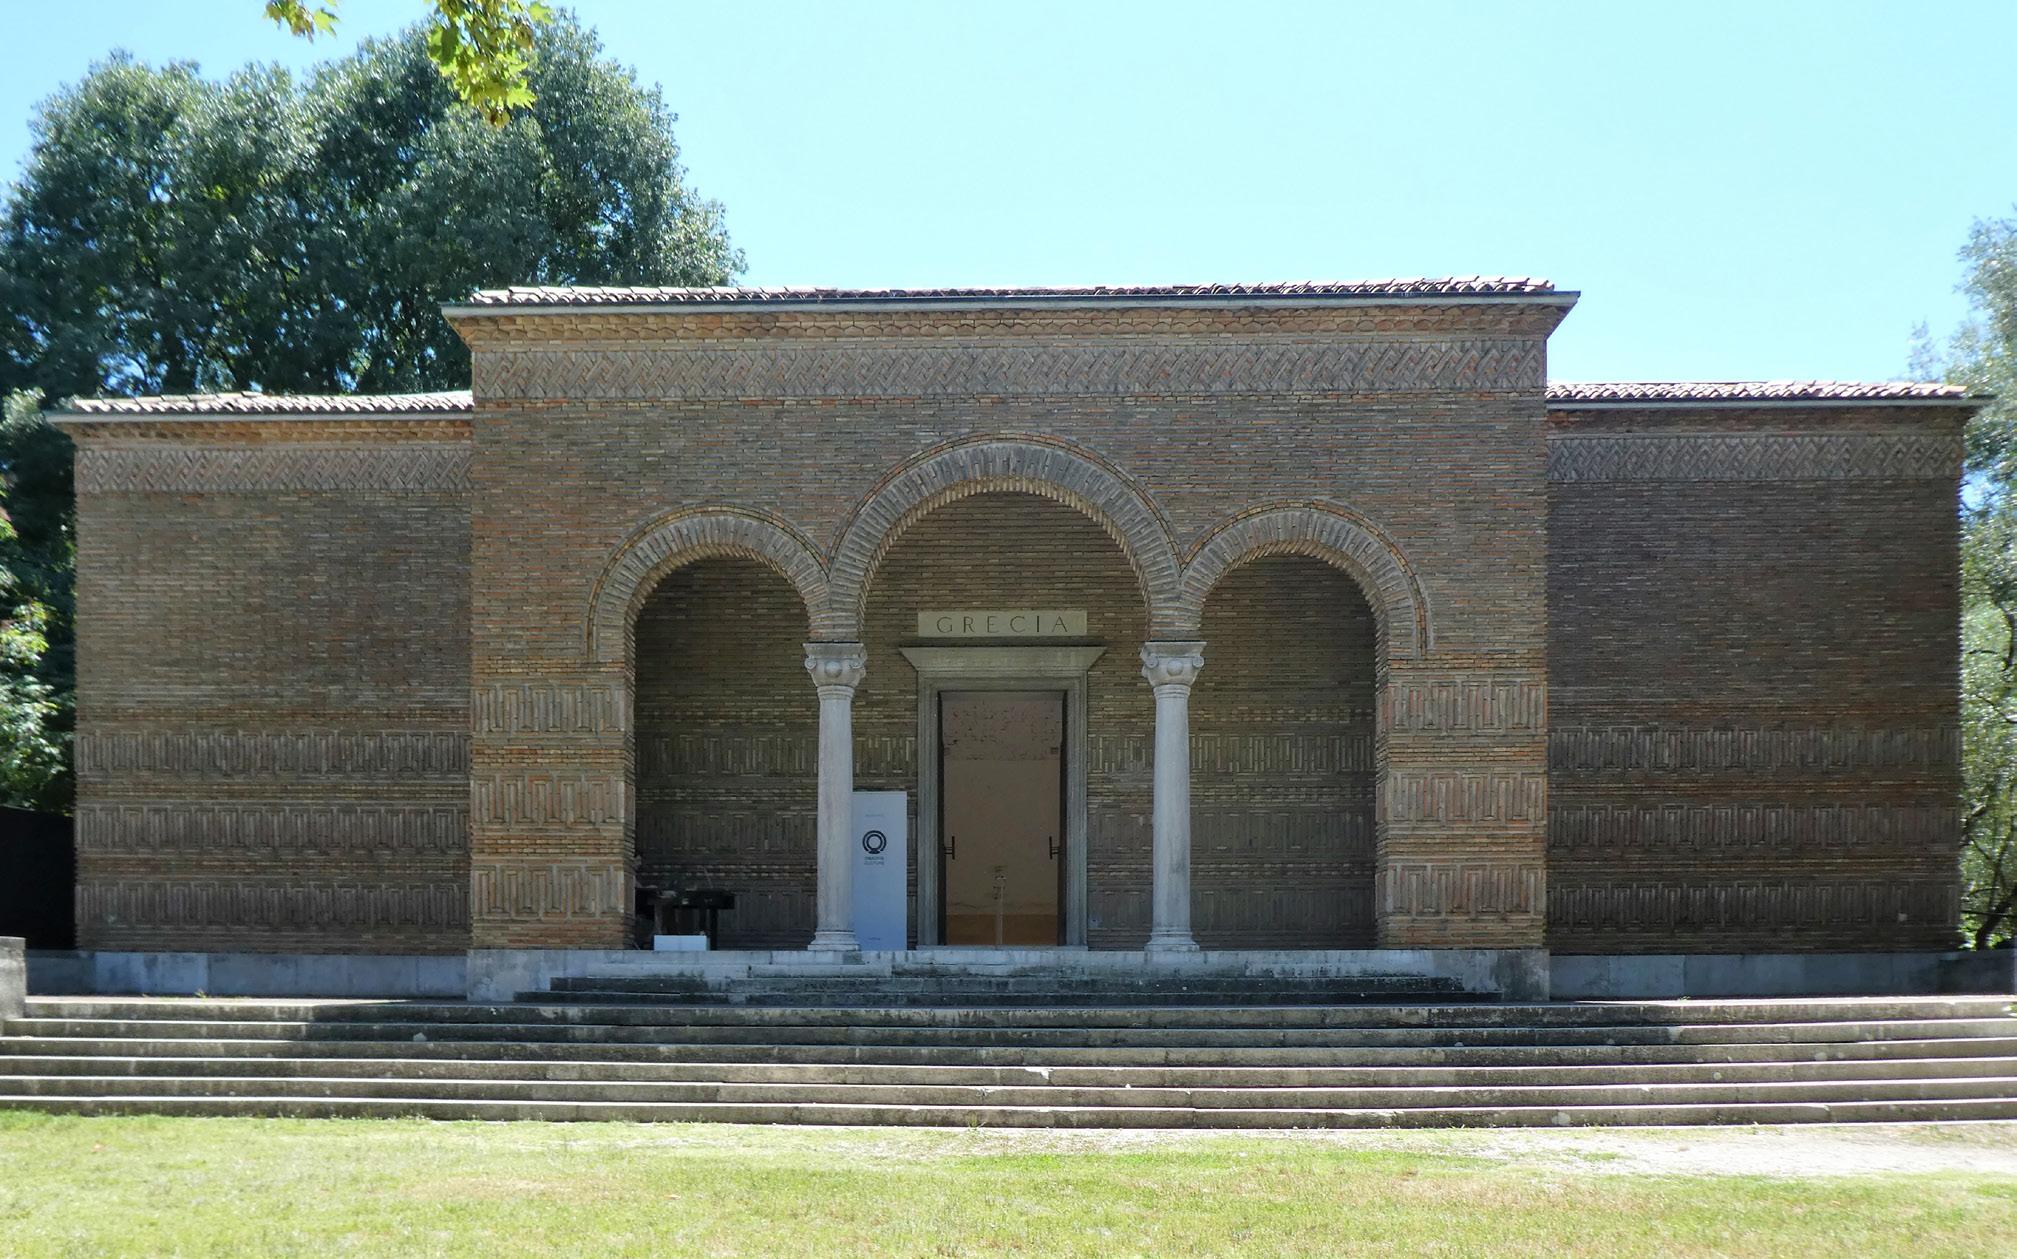 Venice Biennale: Greek Pavilion